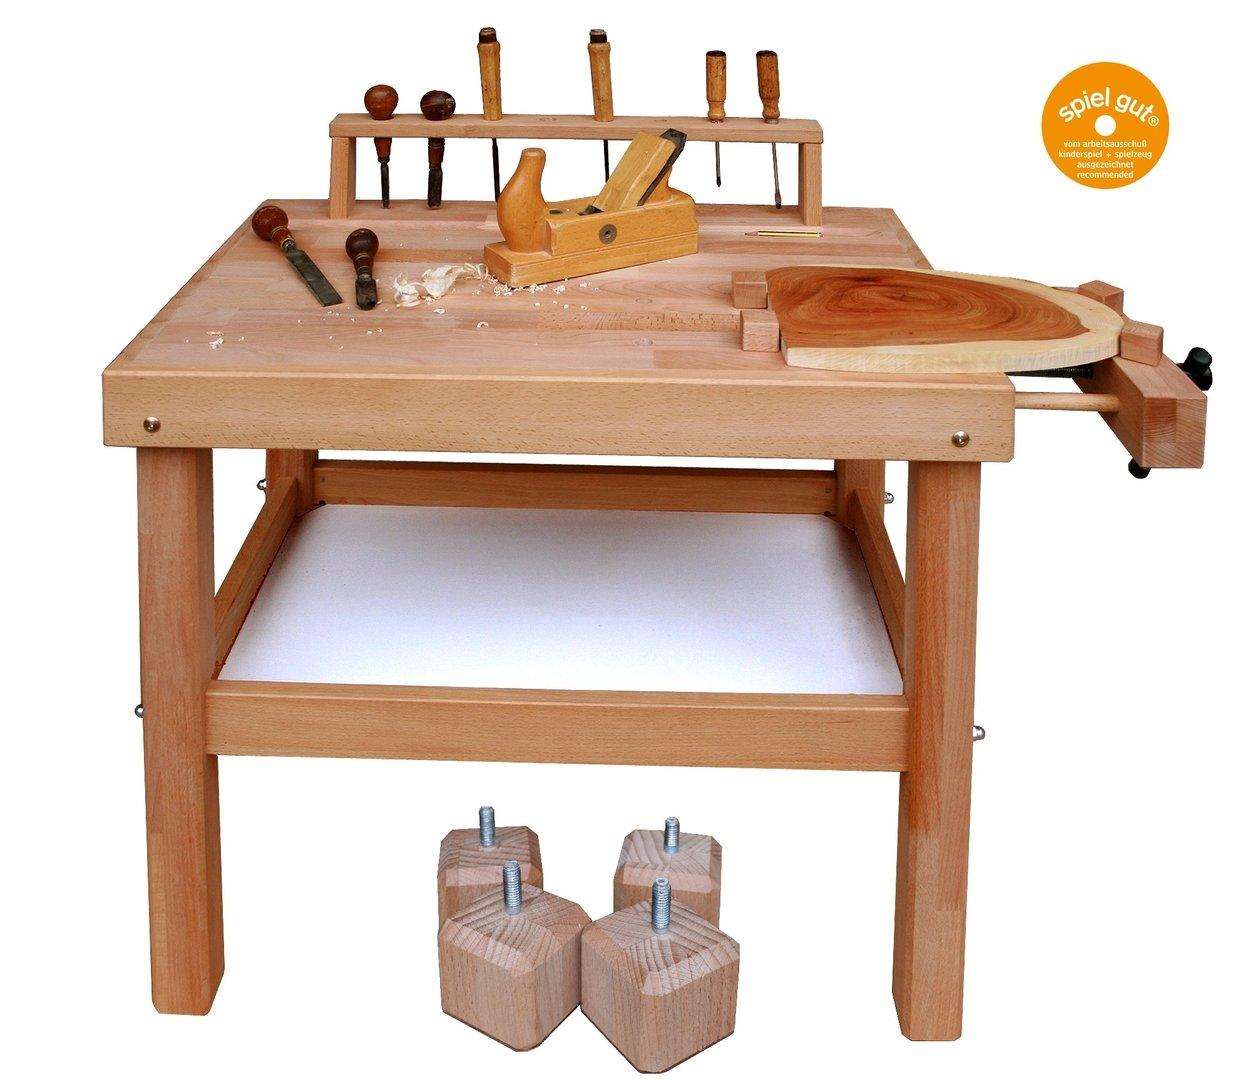 Set Werkbank Kinder Holz Hohenverstellbar Ab 5 Jahren Villa Bambini